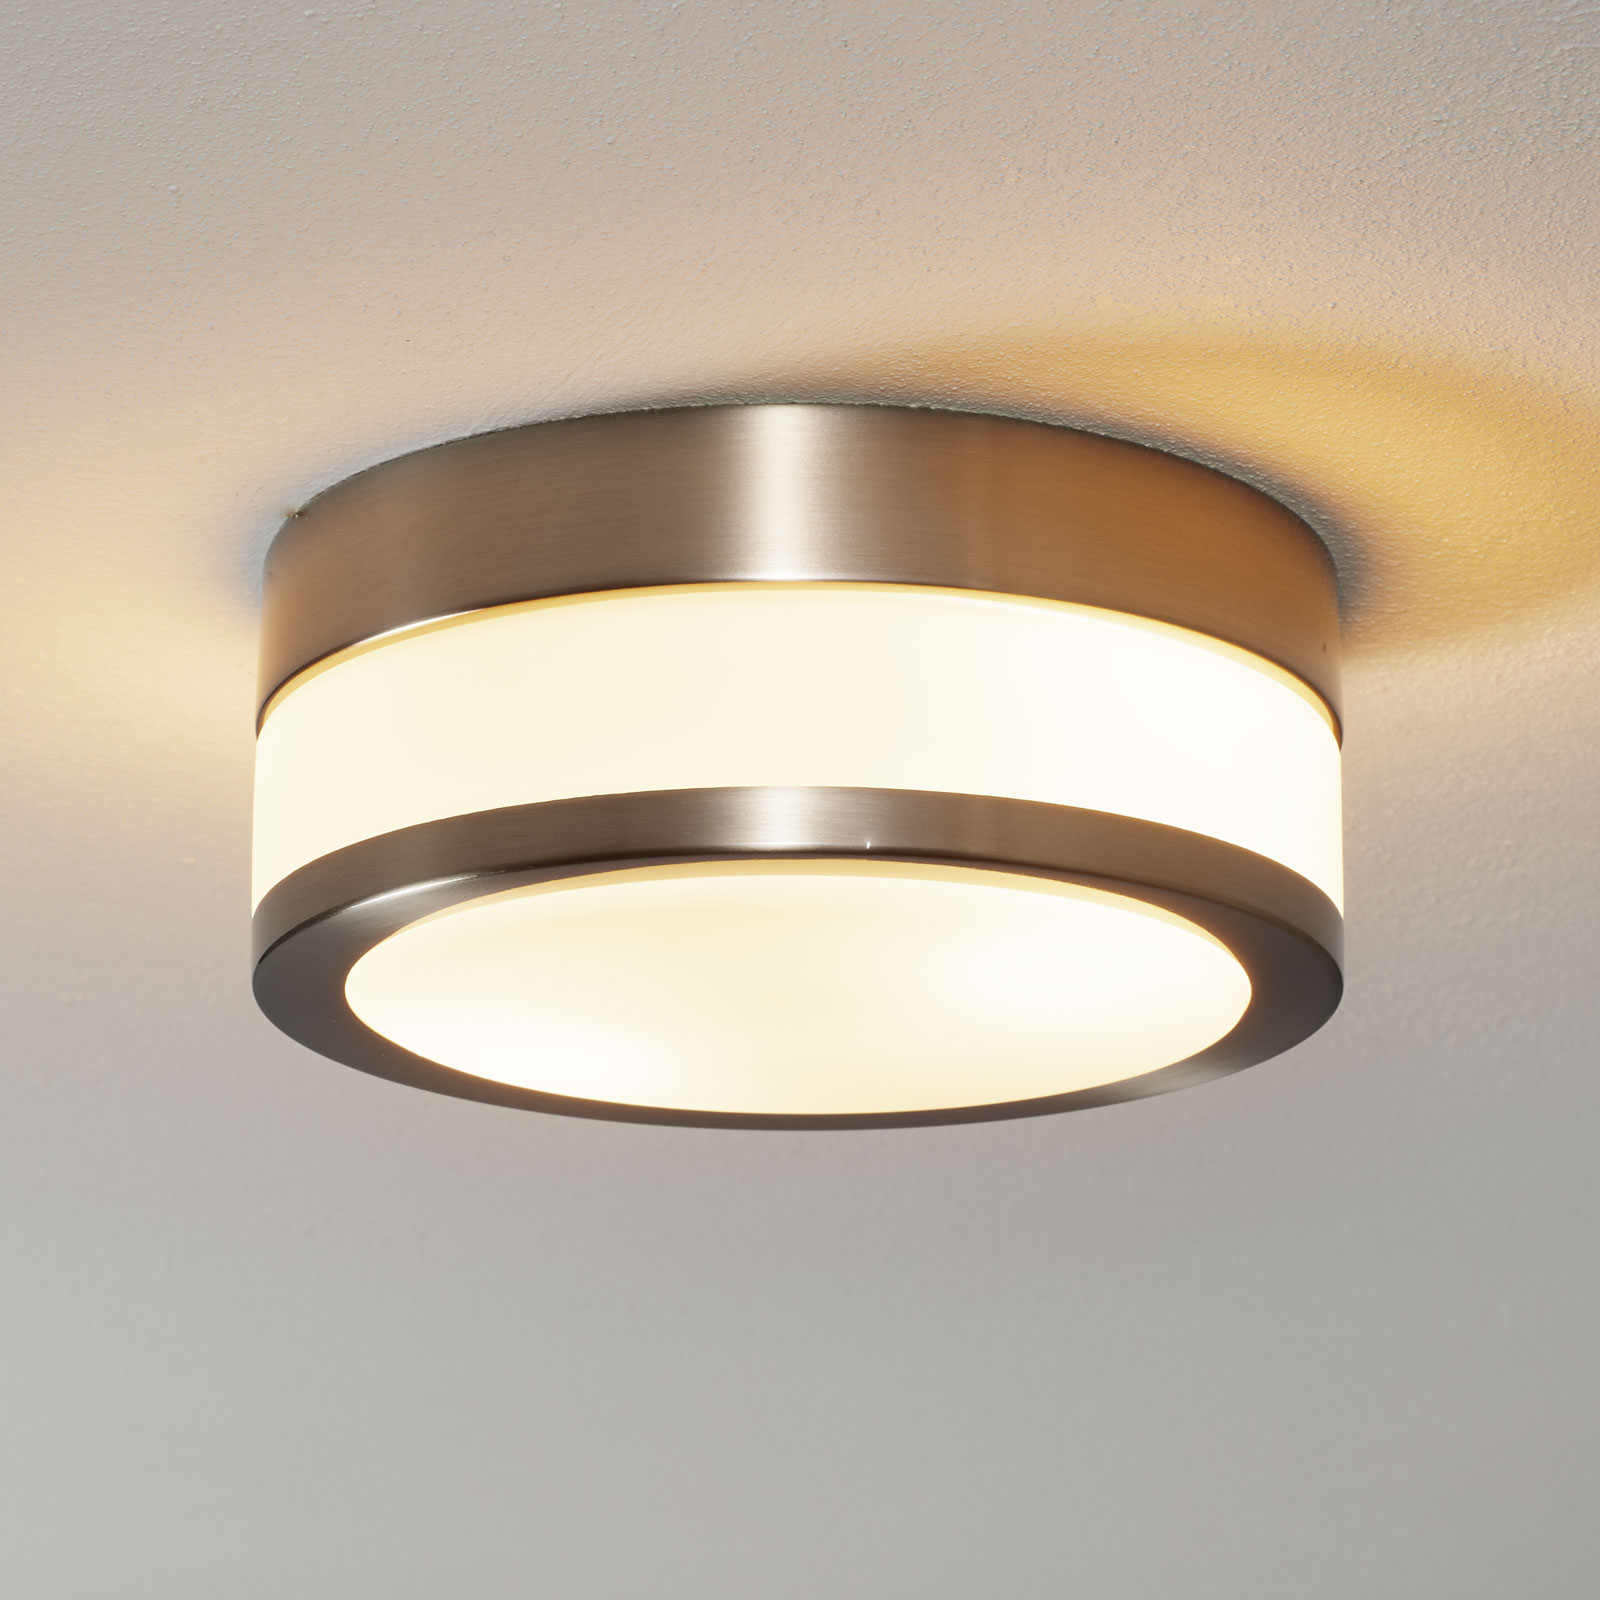 Lindby Flavi Bad-Deckenlampe, Ø 23 cm, nickel